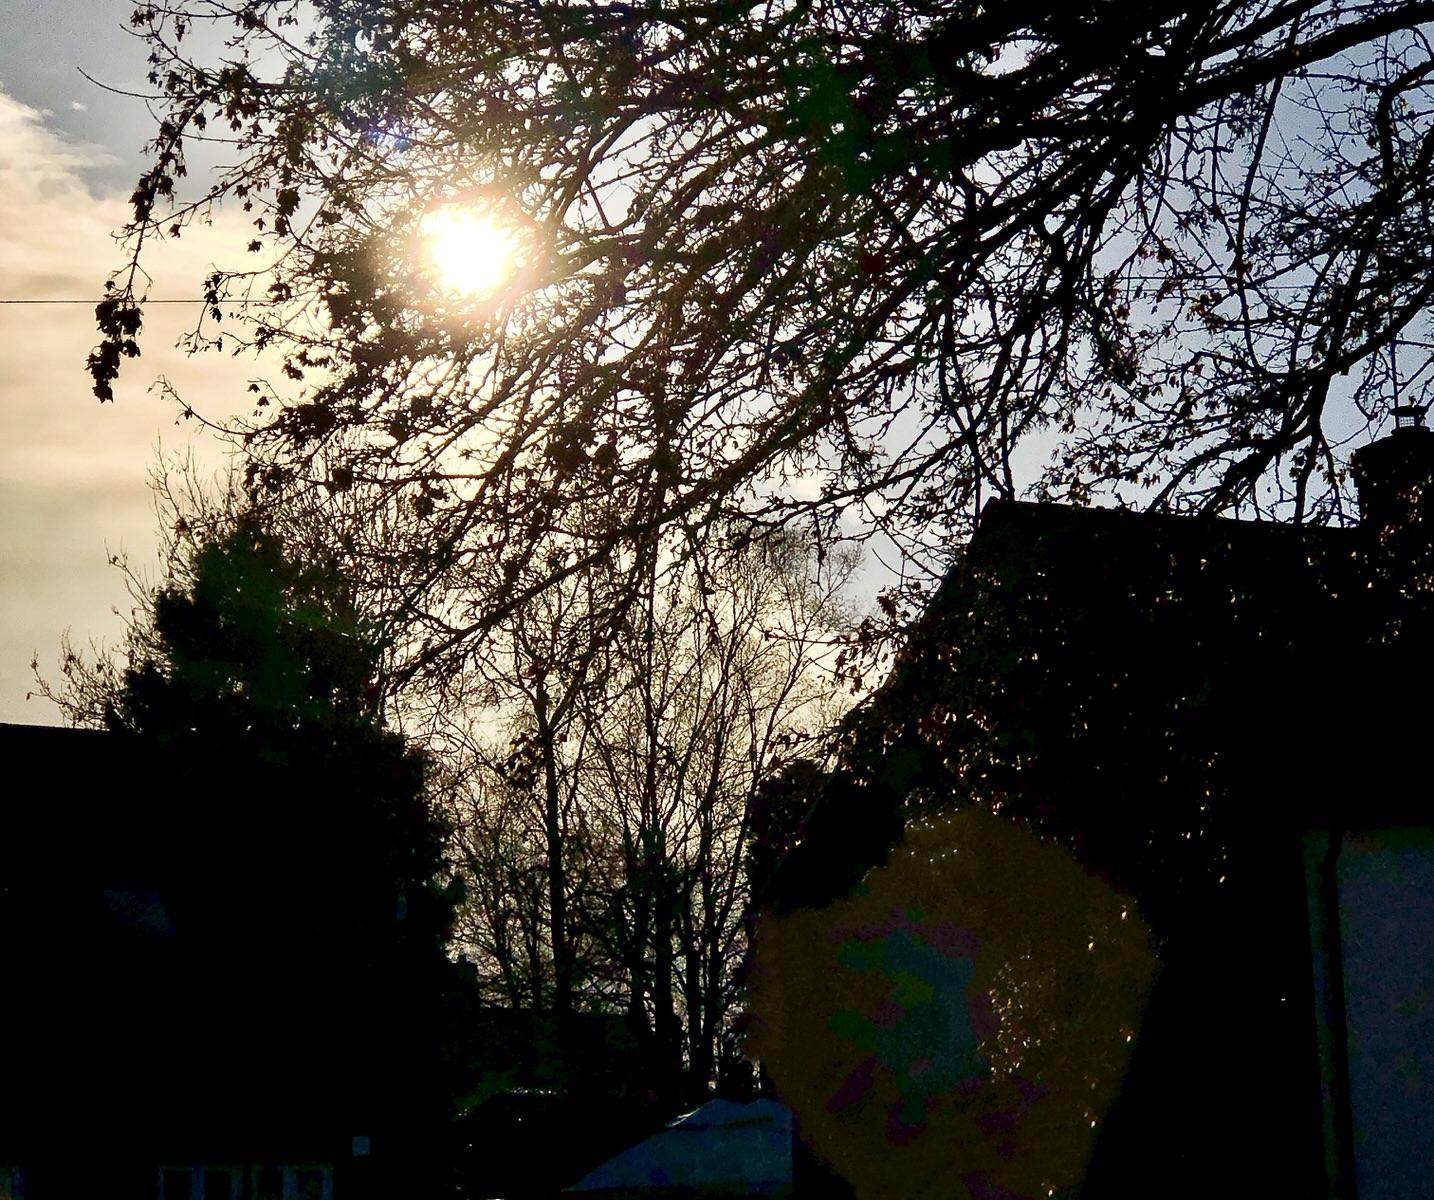 Sunburst through dark winter trees